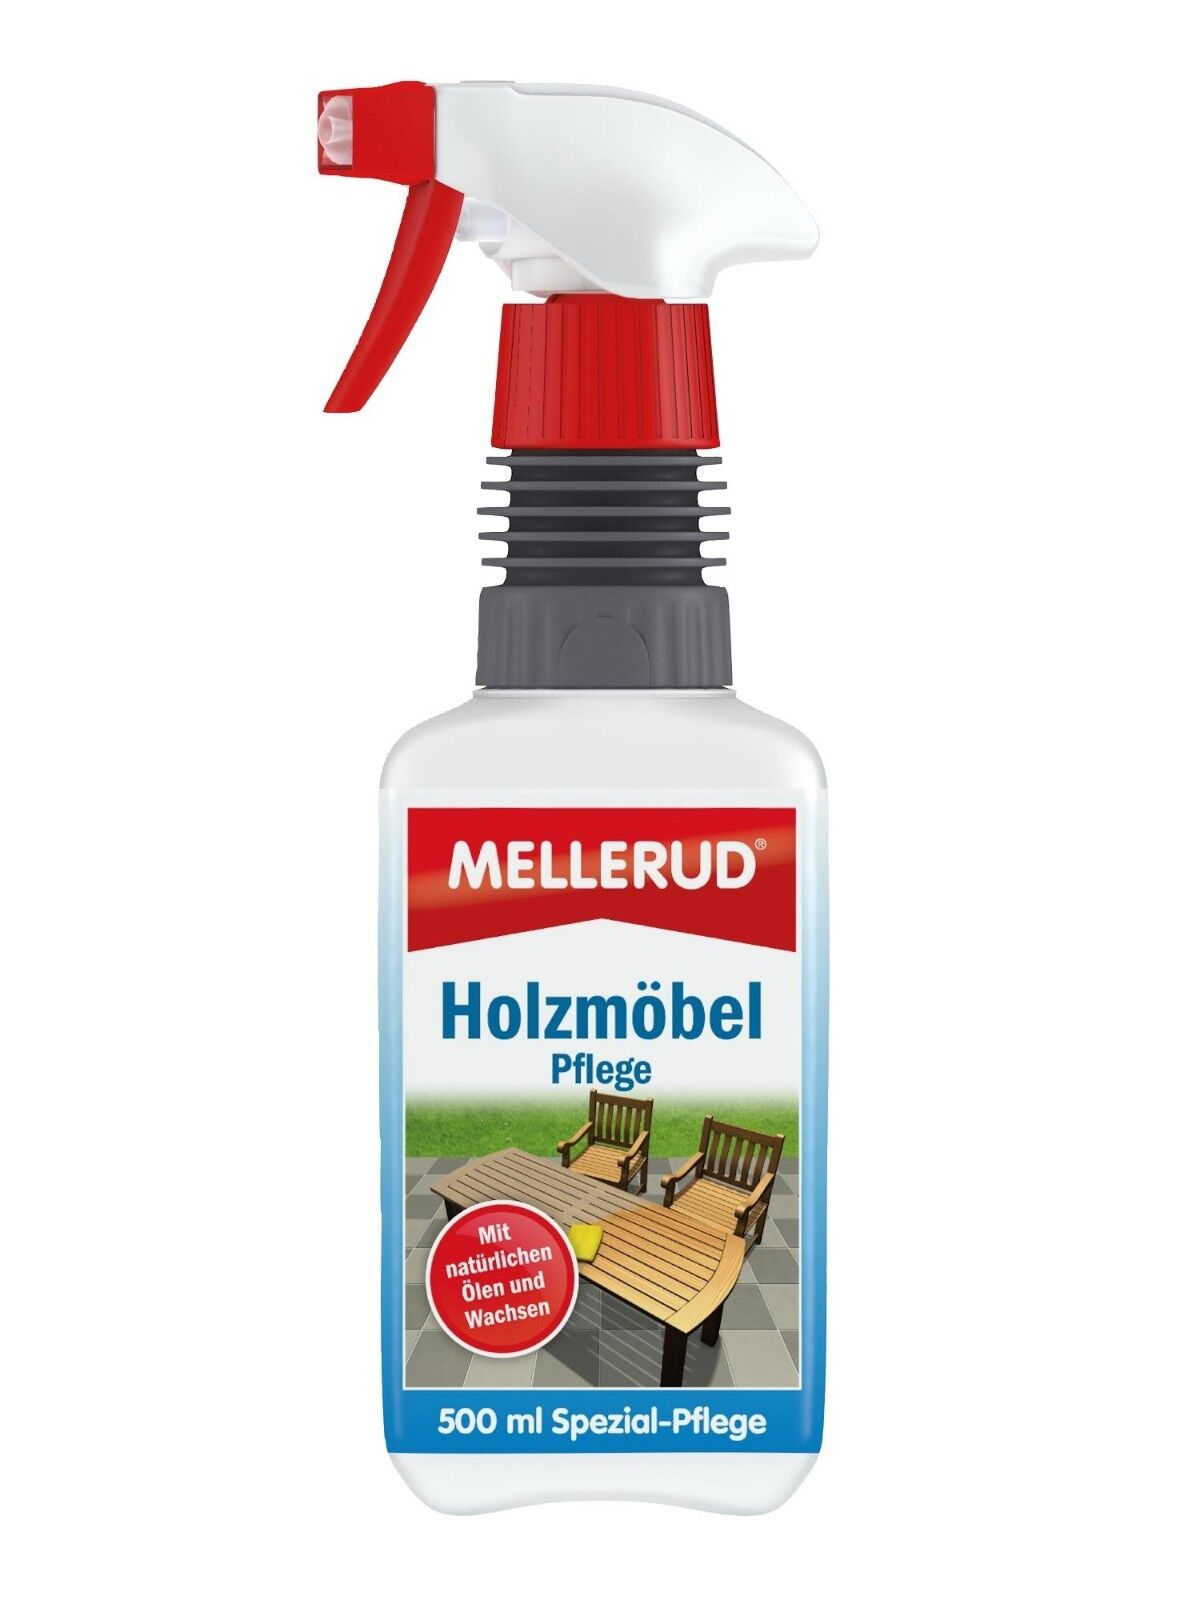 Mellerud Holzmöbel Pflege Spezial-Pflege 0,5 L